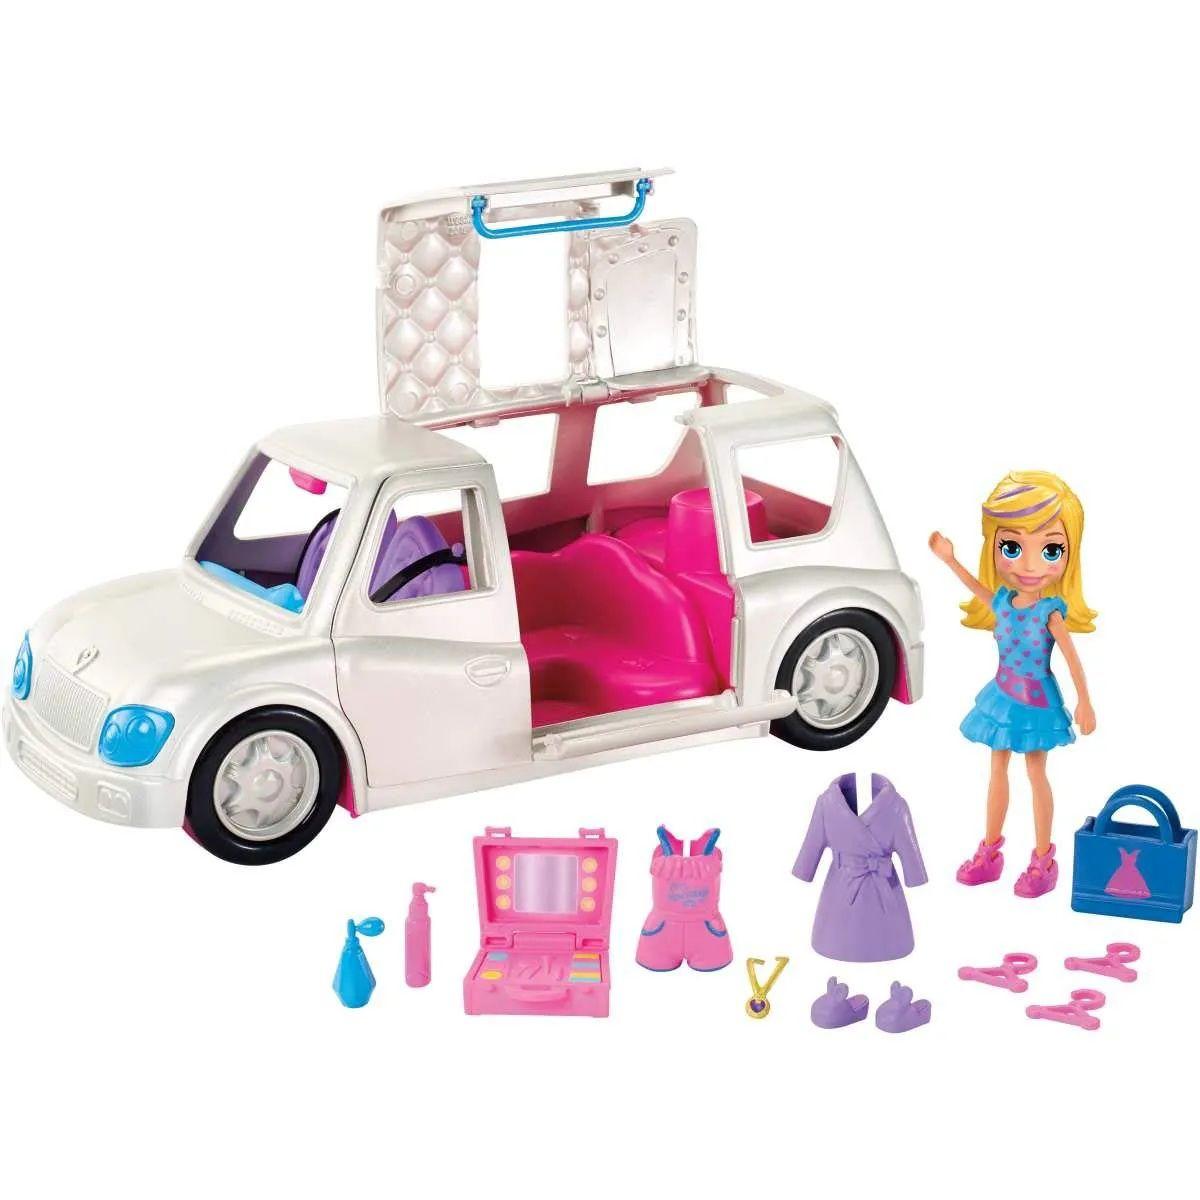 Boneca Polly Pocket Limousine de Luxo - Mattel